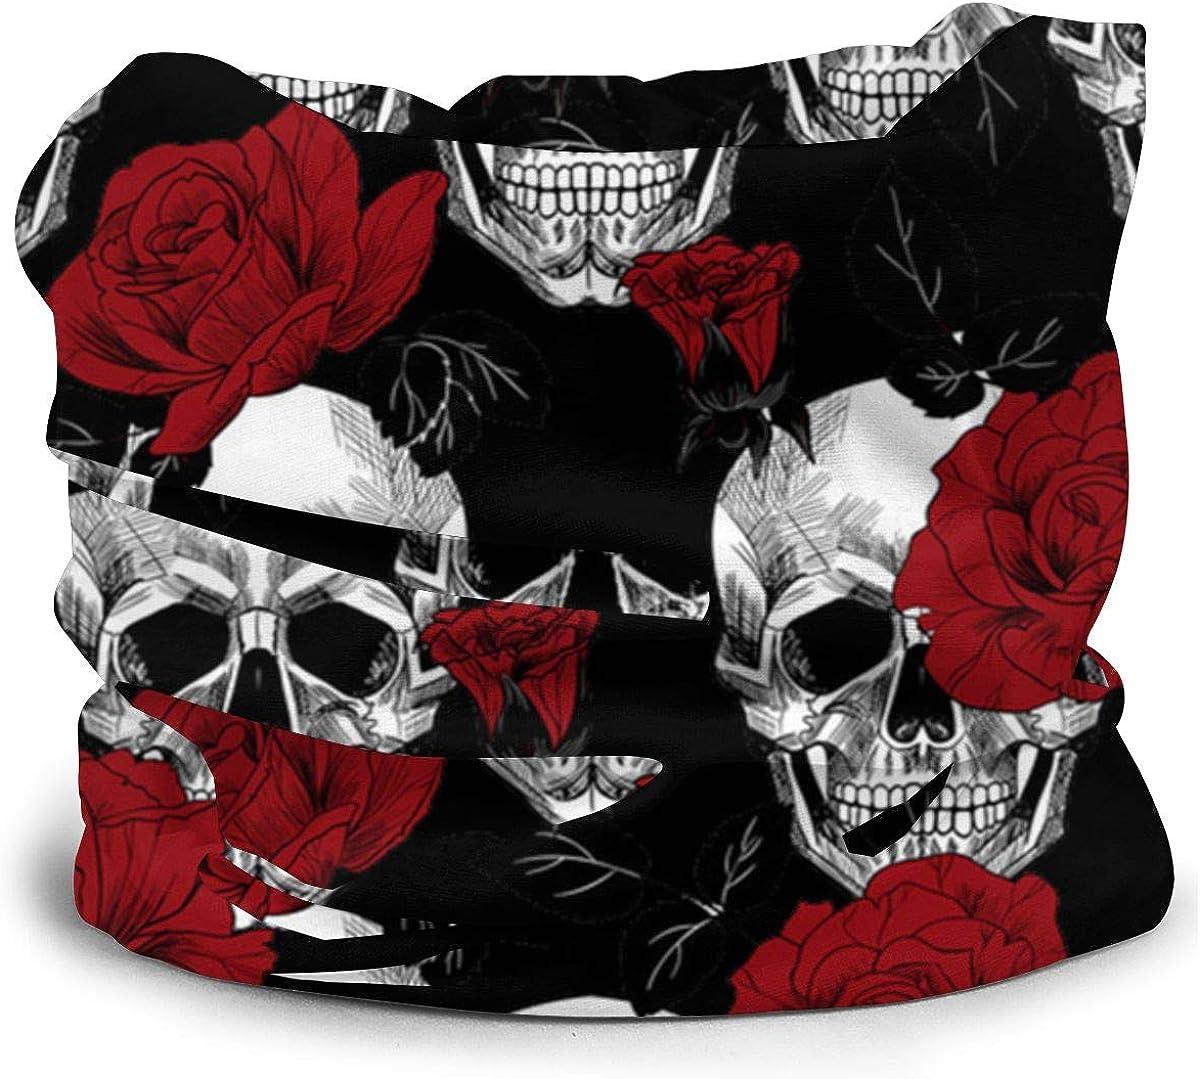 Multifunctional Headband Scarf Neck Gaiter Balaclava Dead Sugar Skull Men /& Women Face Cover Bandana